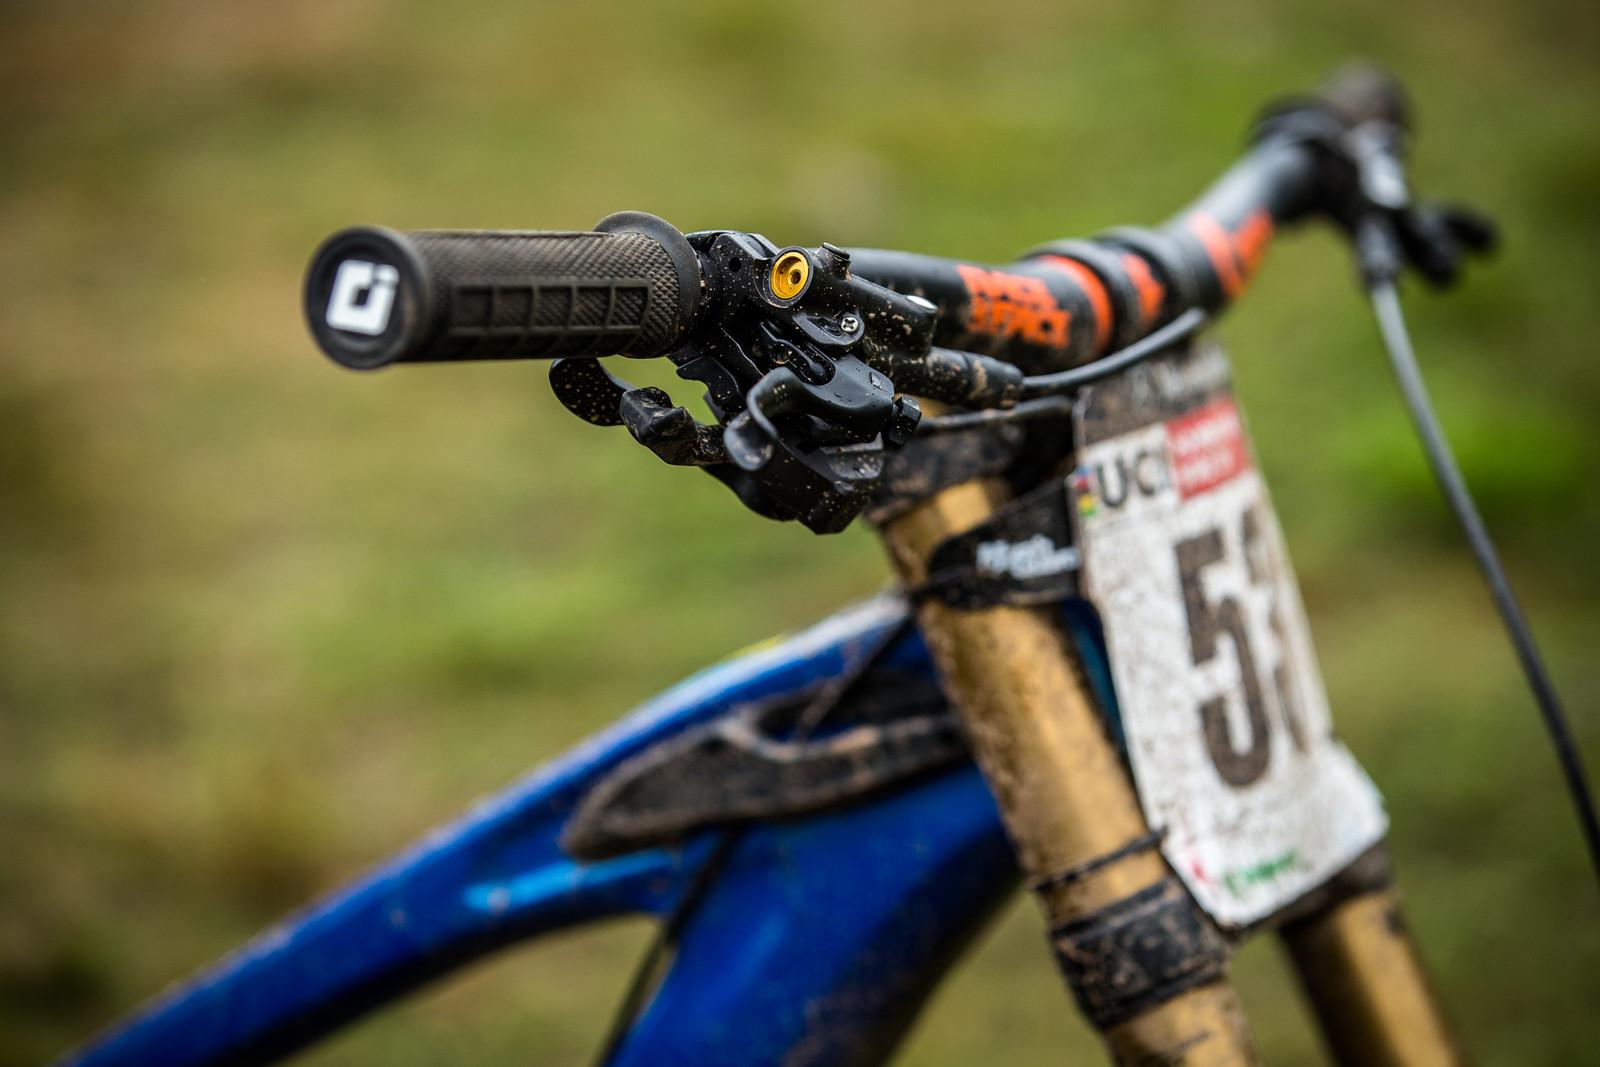 Shimano Saint Brake Levers - WINNING BIKE - Martin Maes' GT Fury - Mountain Biking Pictures - Vital MTB